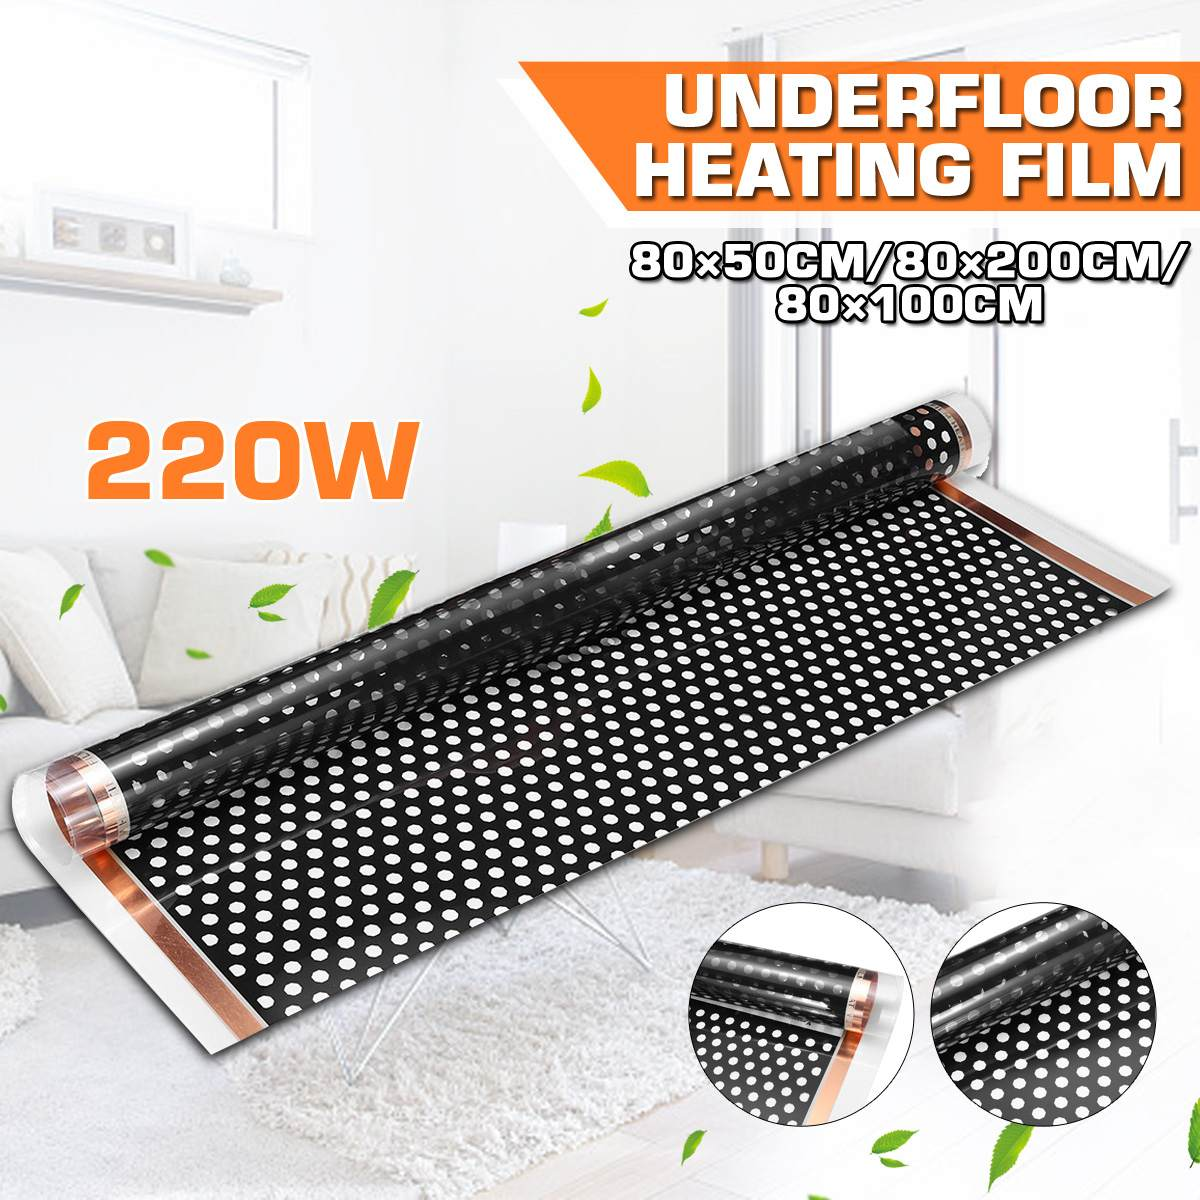 80x200cm 220W Electric Heating Mat Underfloor Heating Film Infrared Warm Floor Heating Film Electric High Quality Carbon Fiber